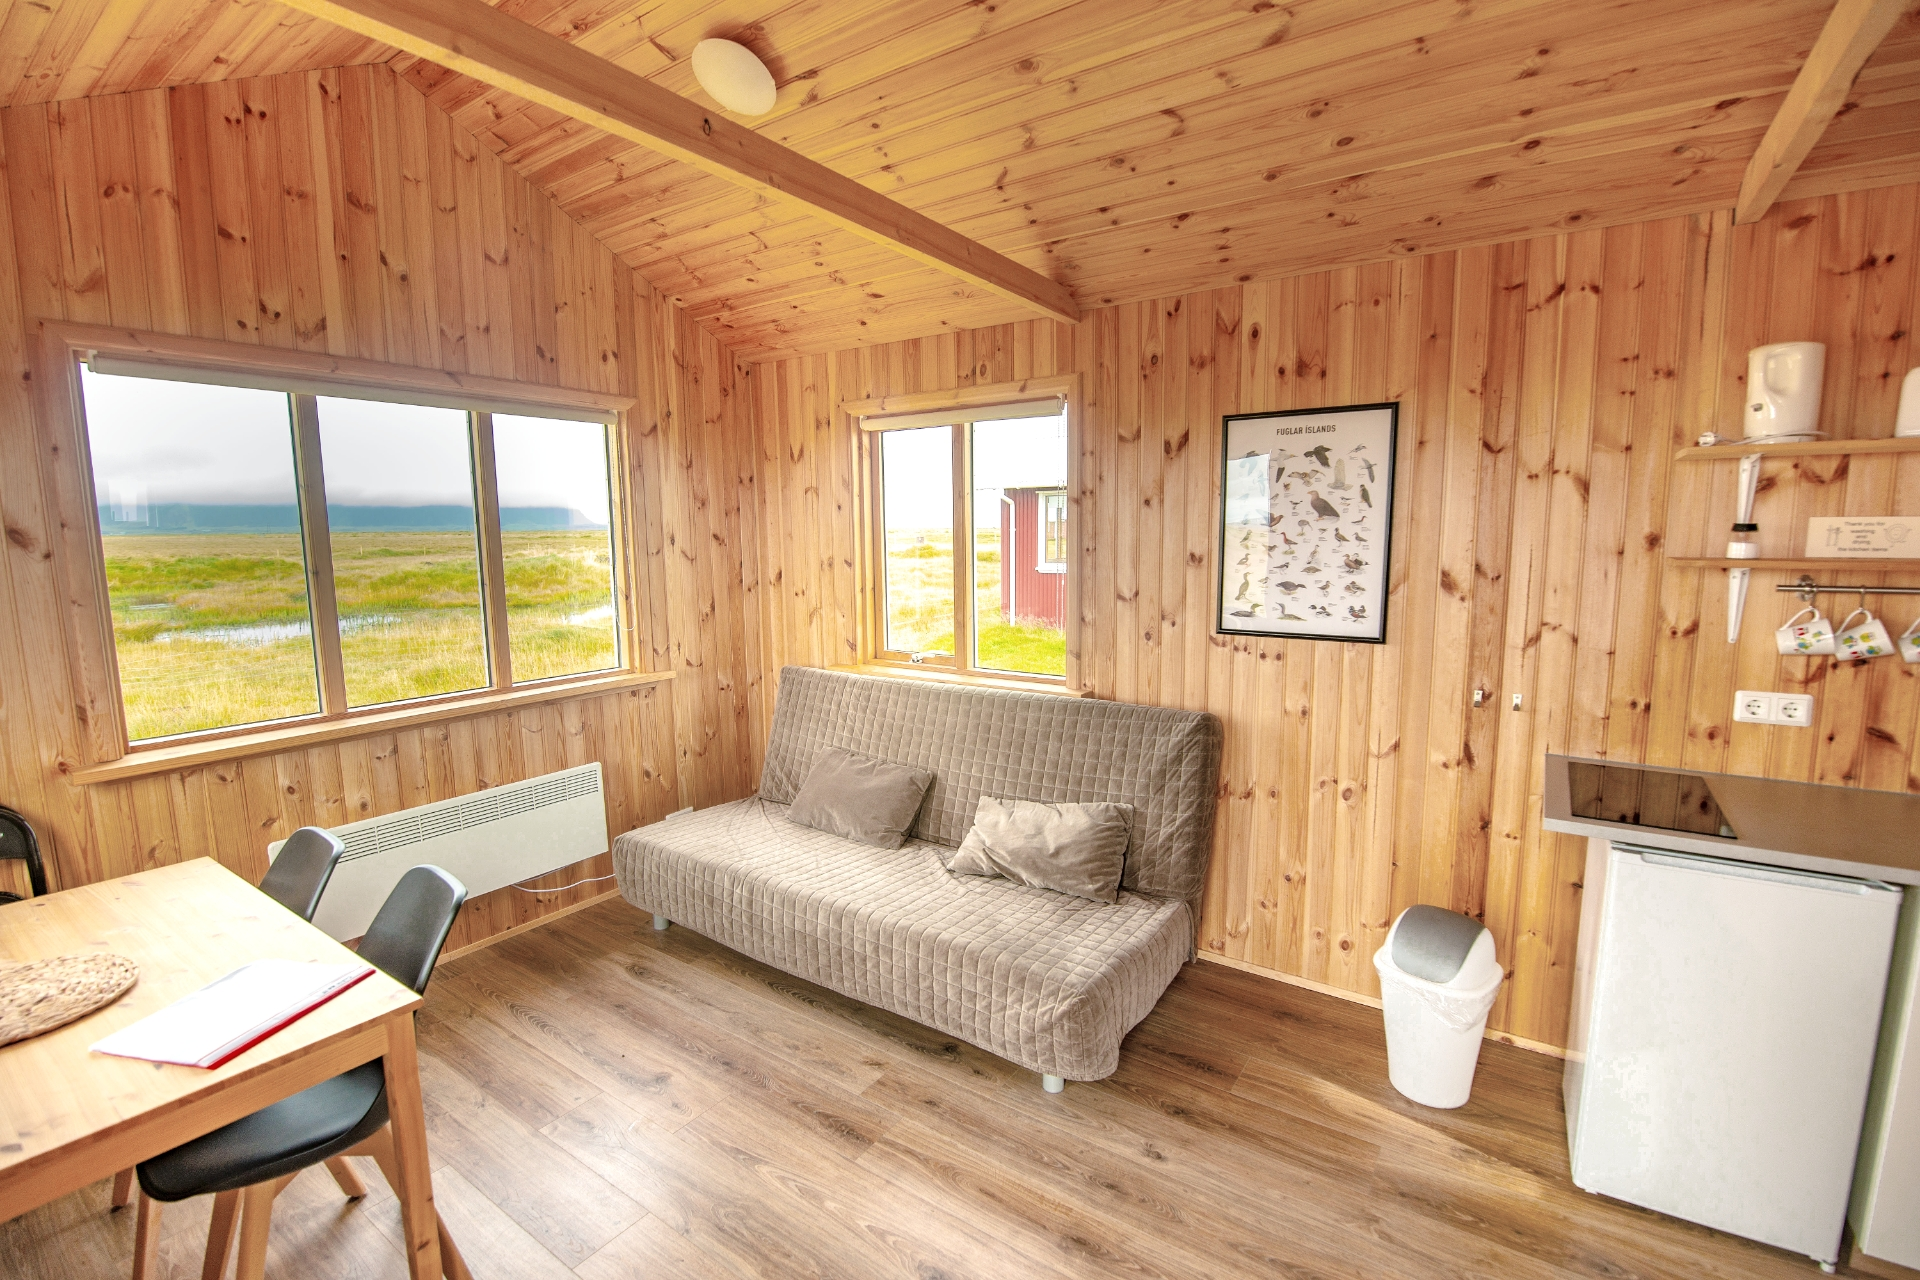 Lambhus 20m2 Cabin Sleeper sofa svefnsófi